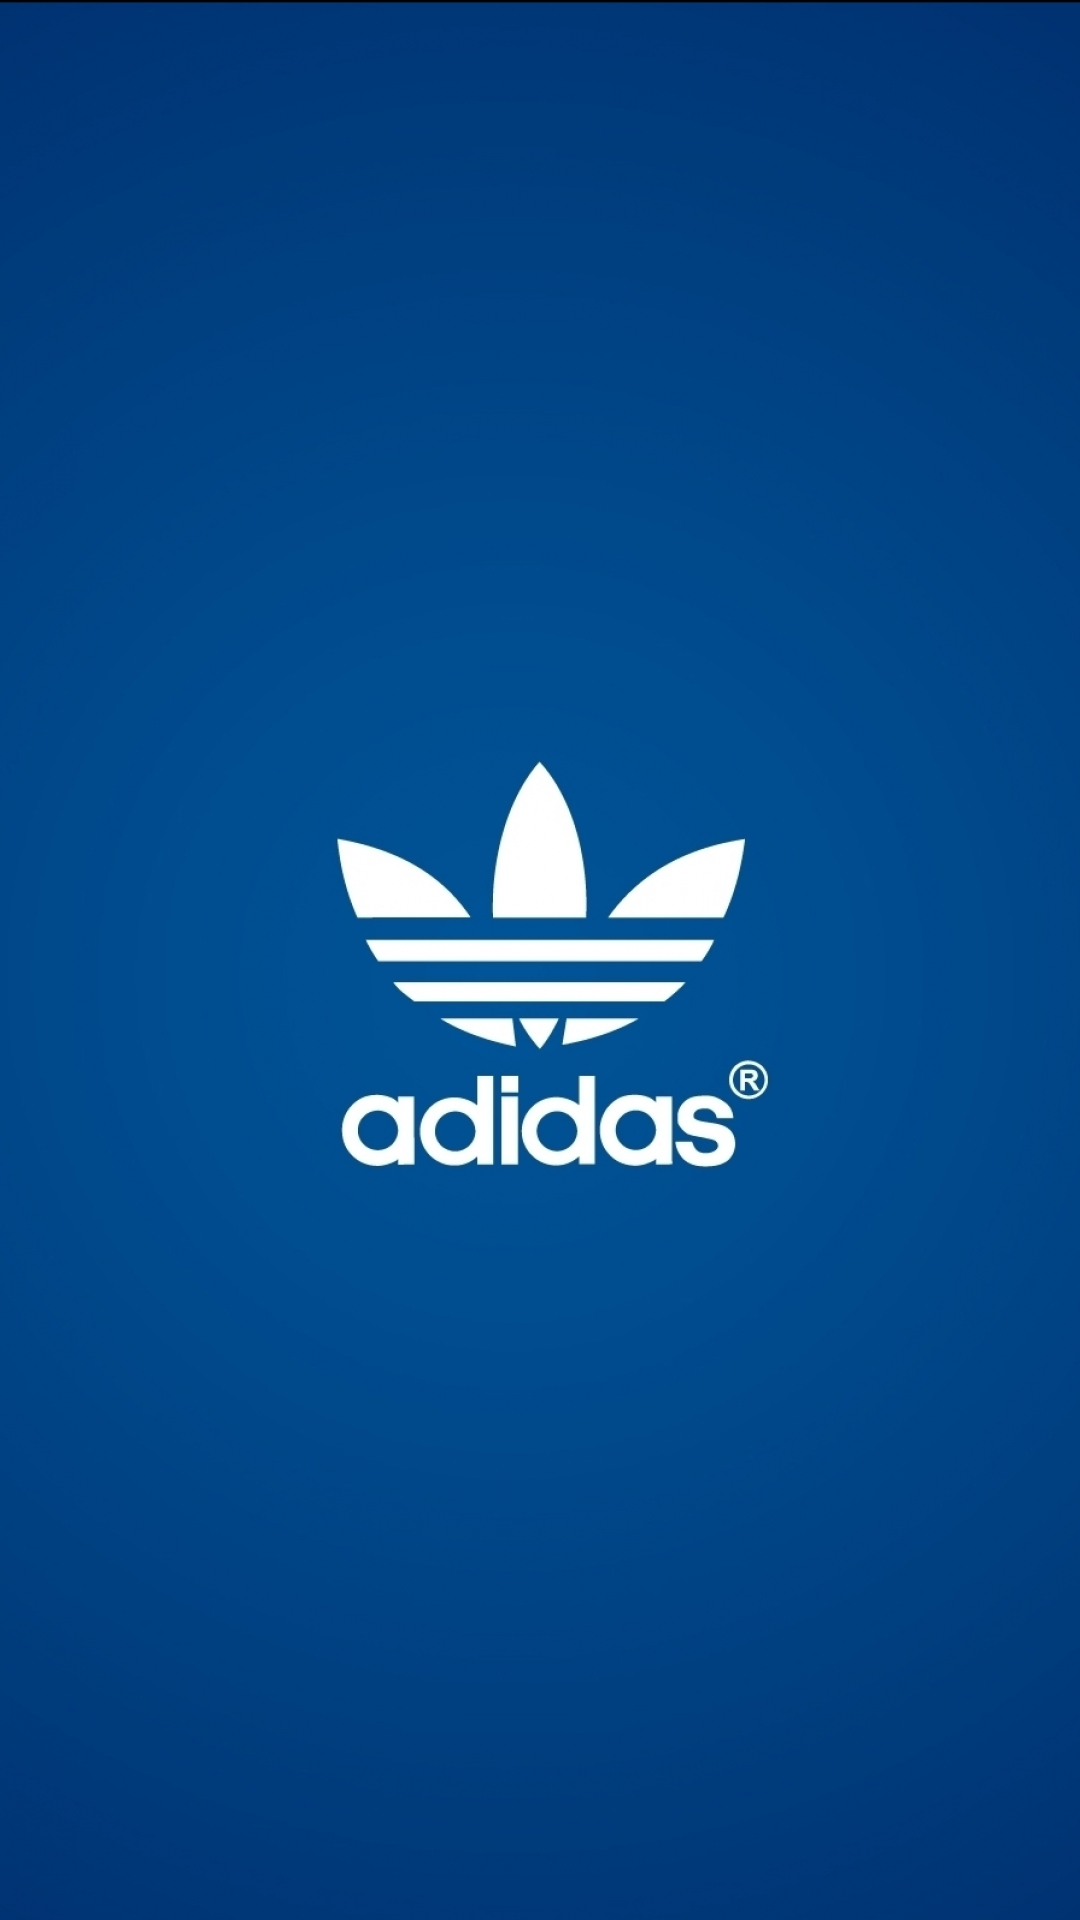 adidas wallpaper iphone 7